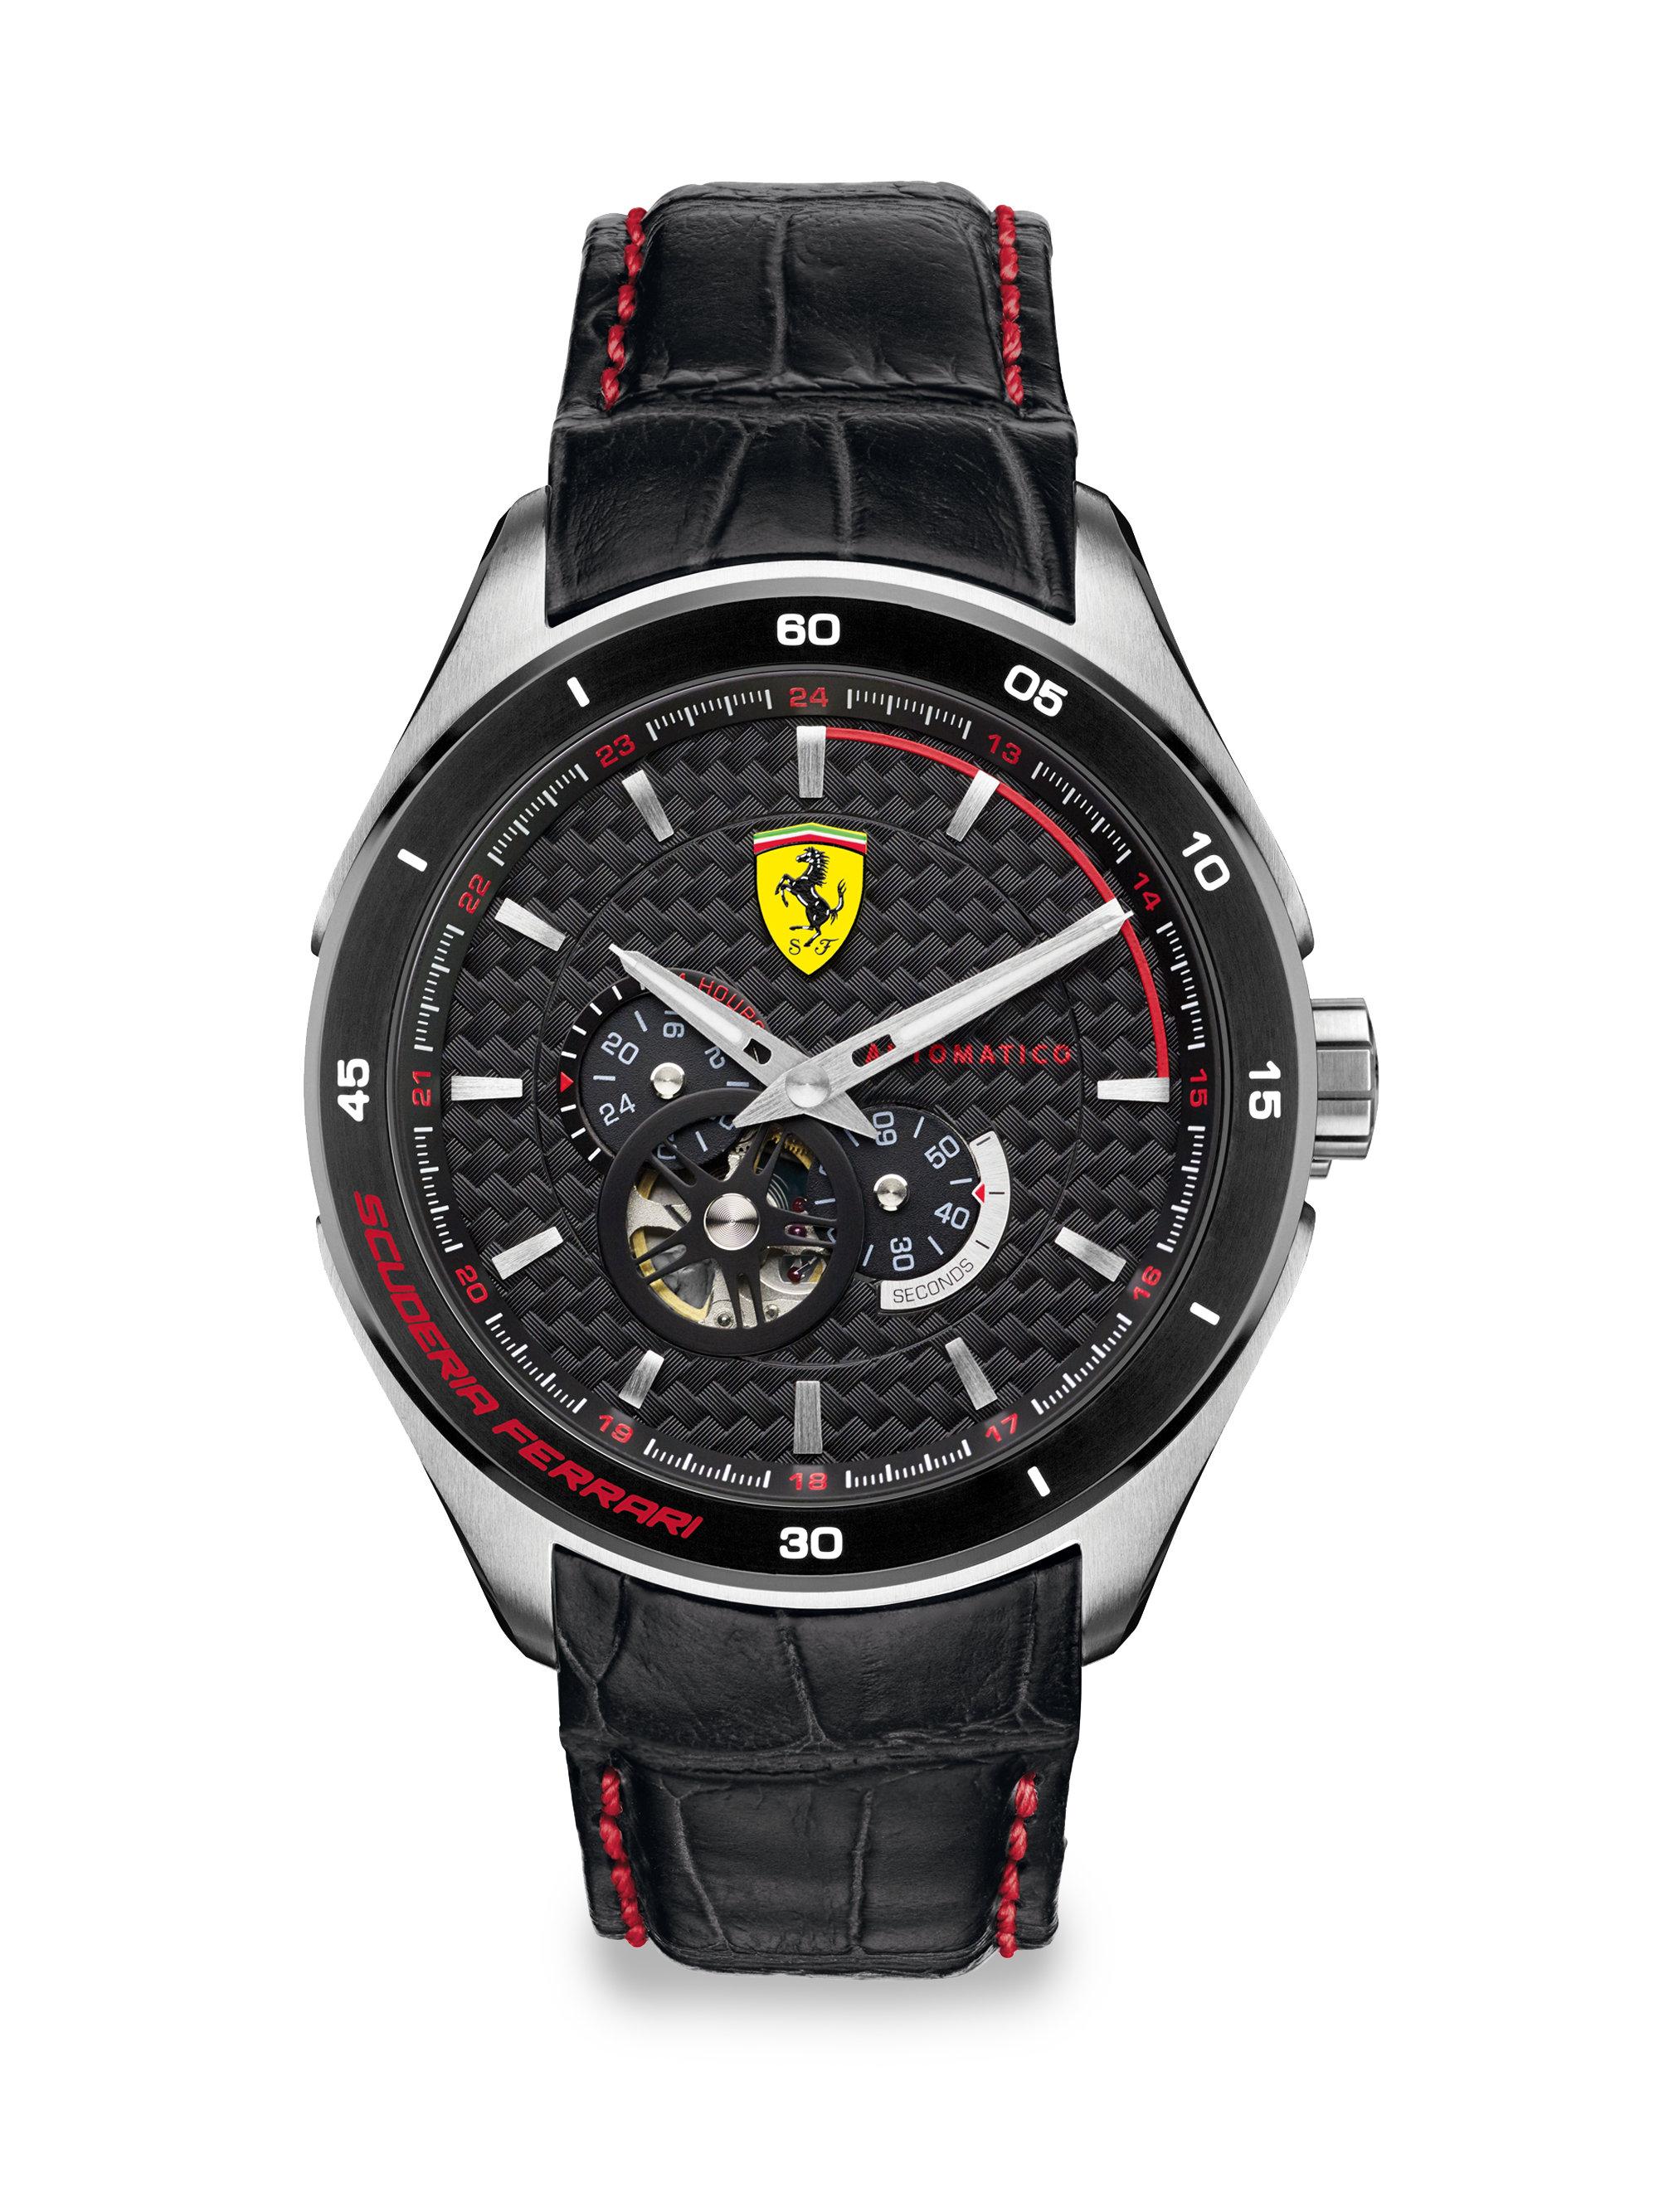 watch watches giuseppe rolex orafa orologio product datejust polso wrist ferrari secondo arte di lady sas womens